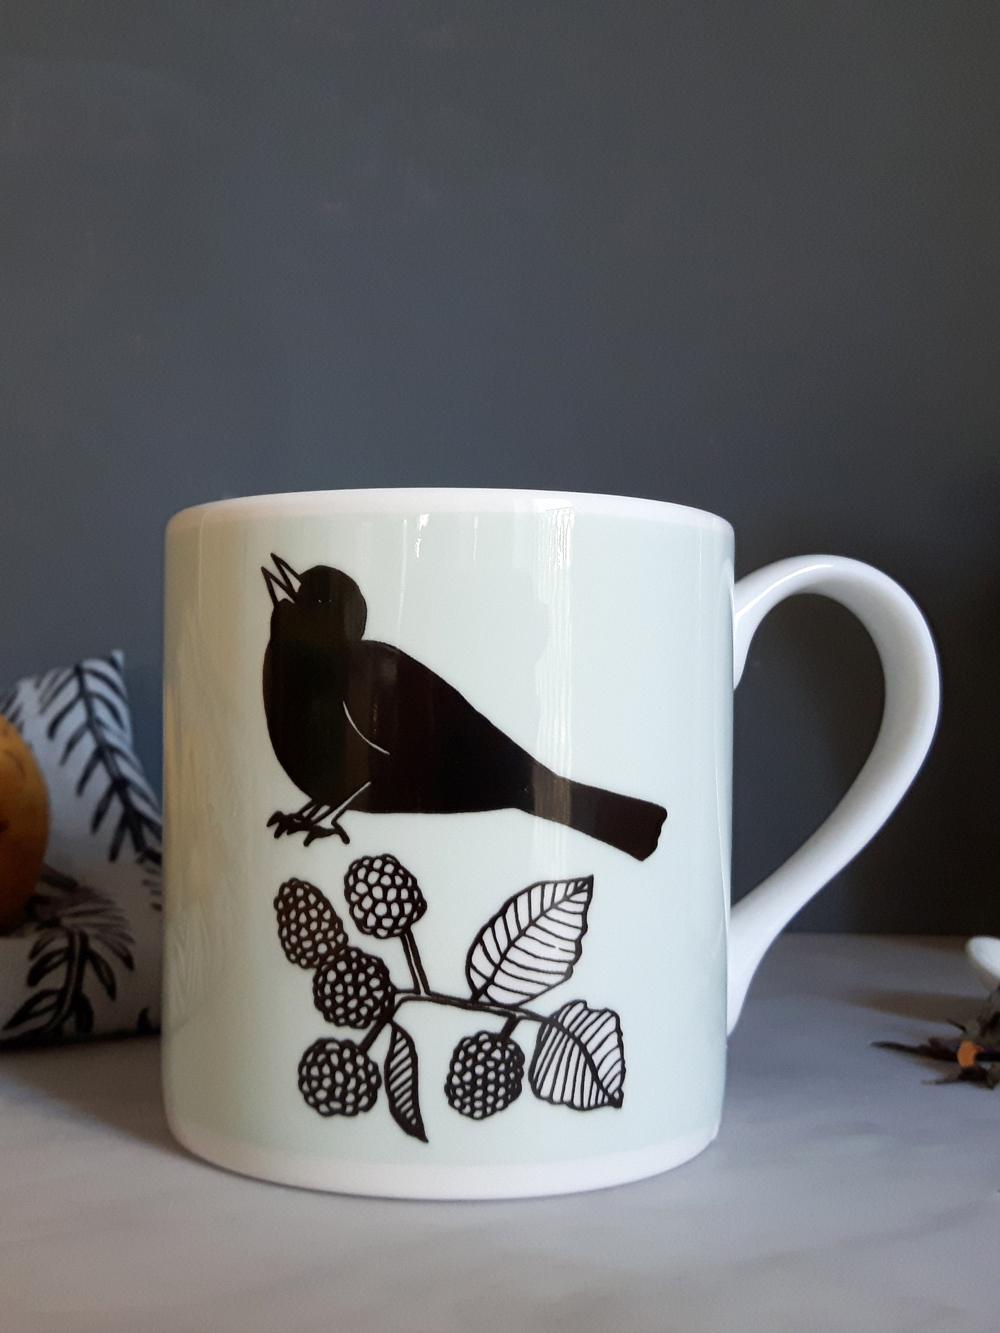 Maurice-mug-on-dark